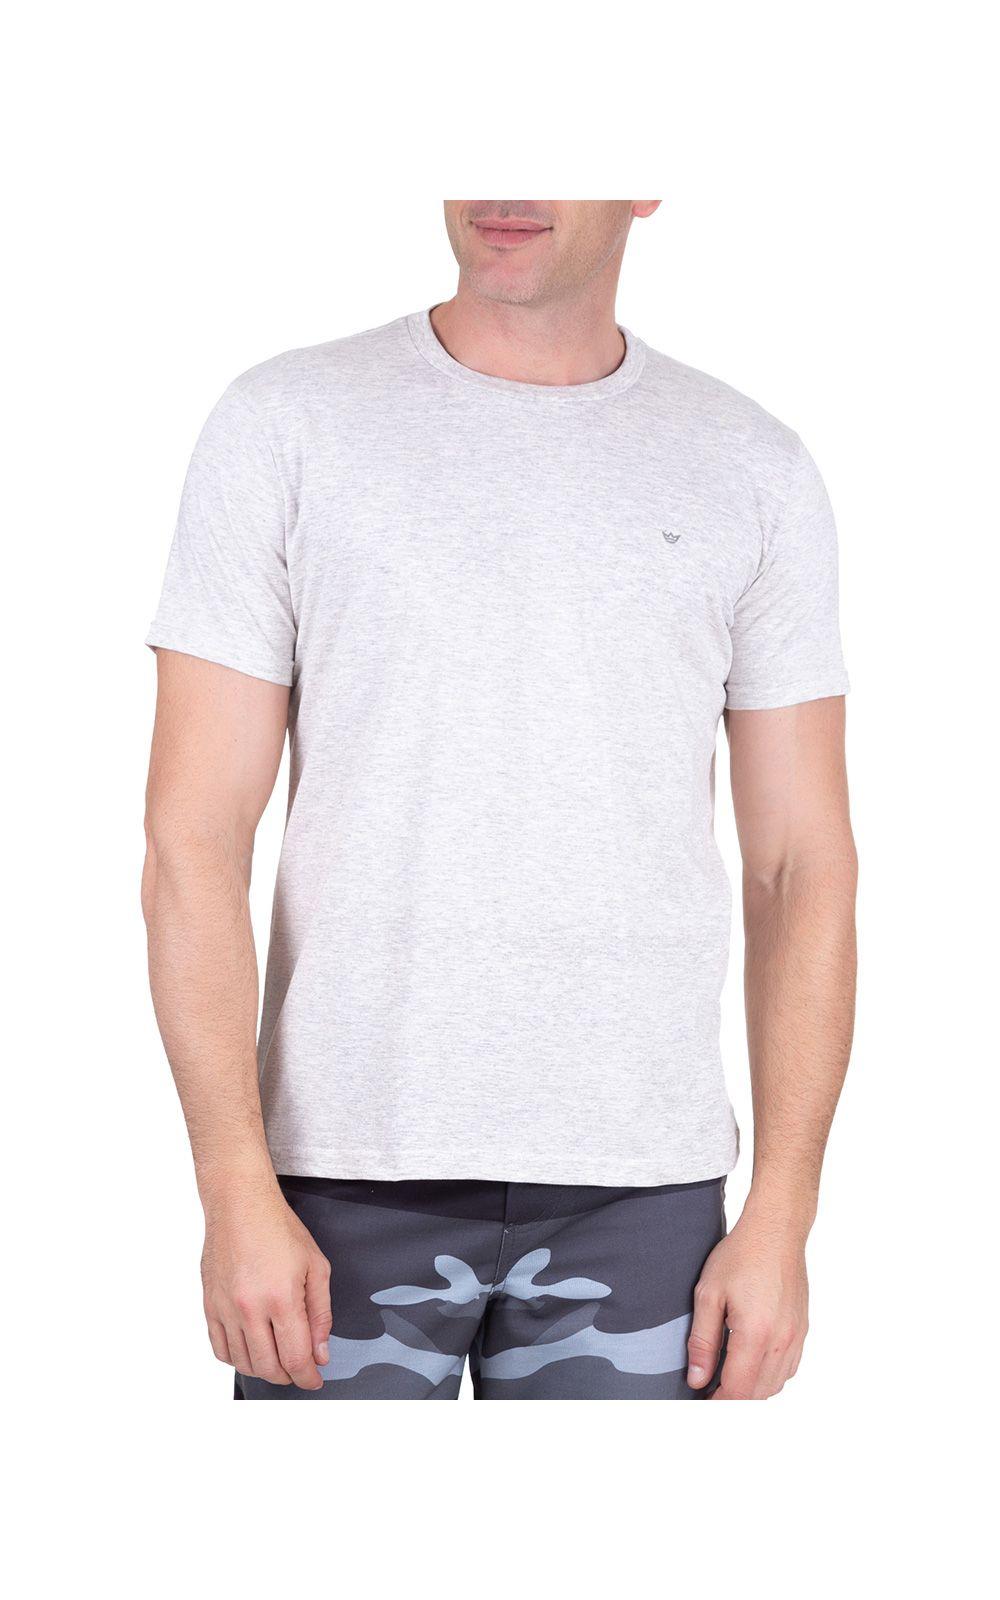 Foto 1 - Camiseta Masculina Cinza Lisa